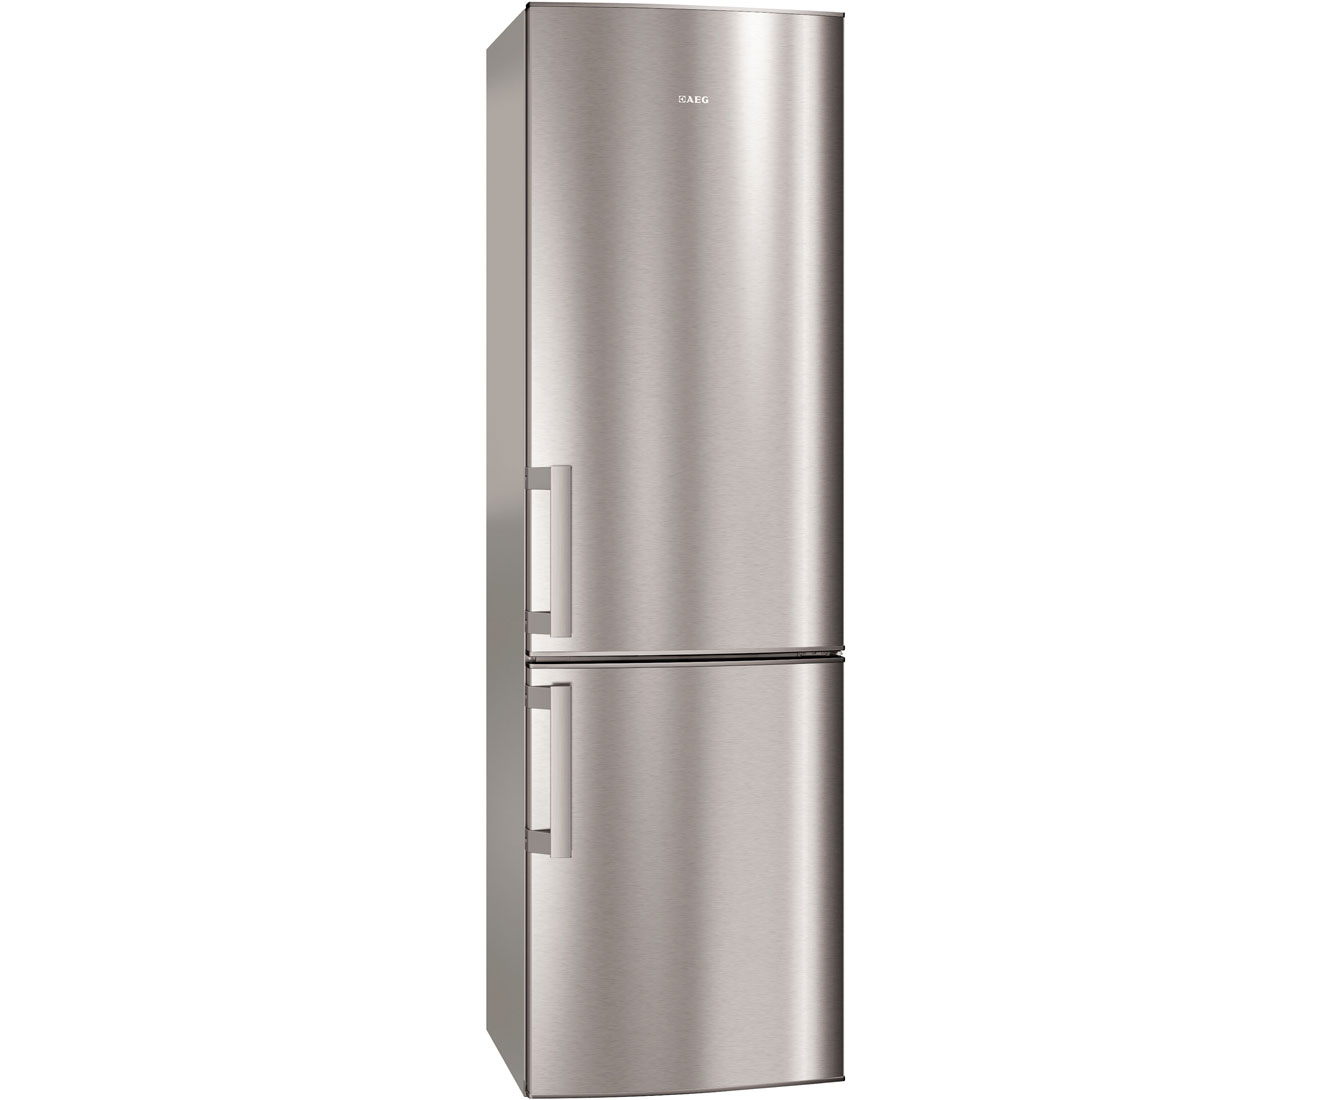 Aeg Kühlschrank Umzug : Aeg santo s53620csx2 kühl gefrierkombination edelstahl silber a